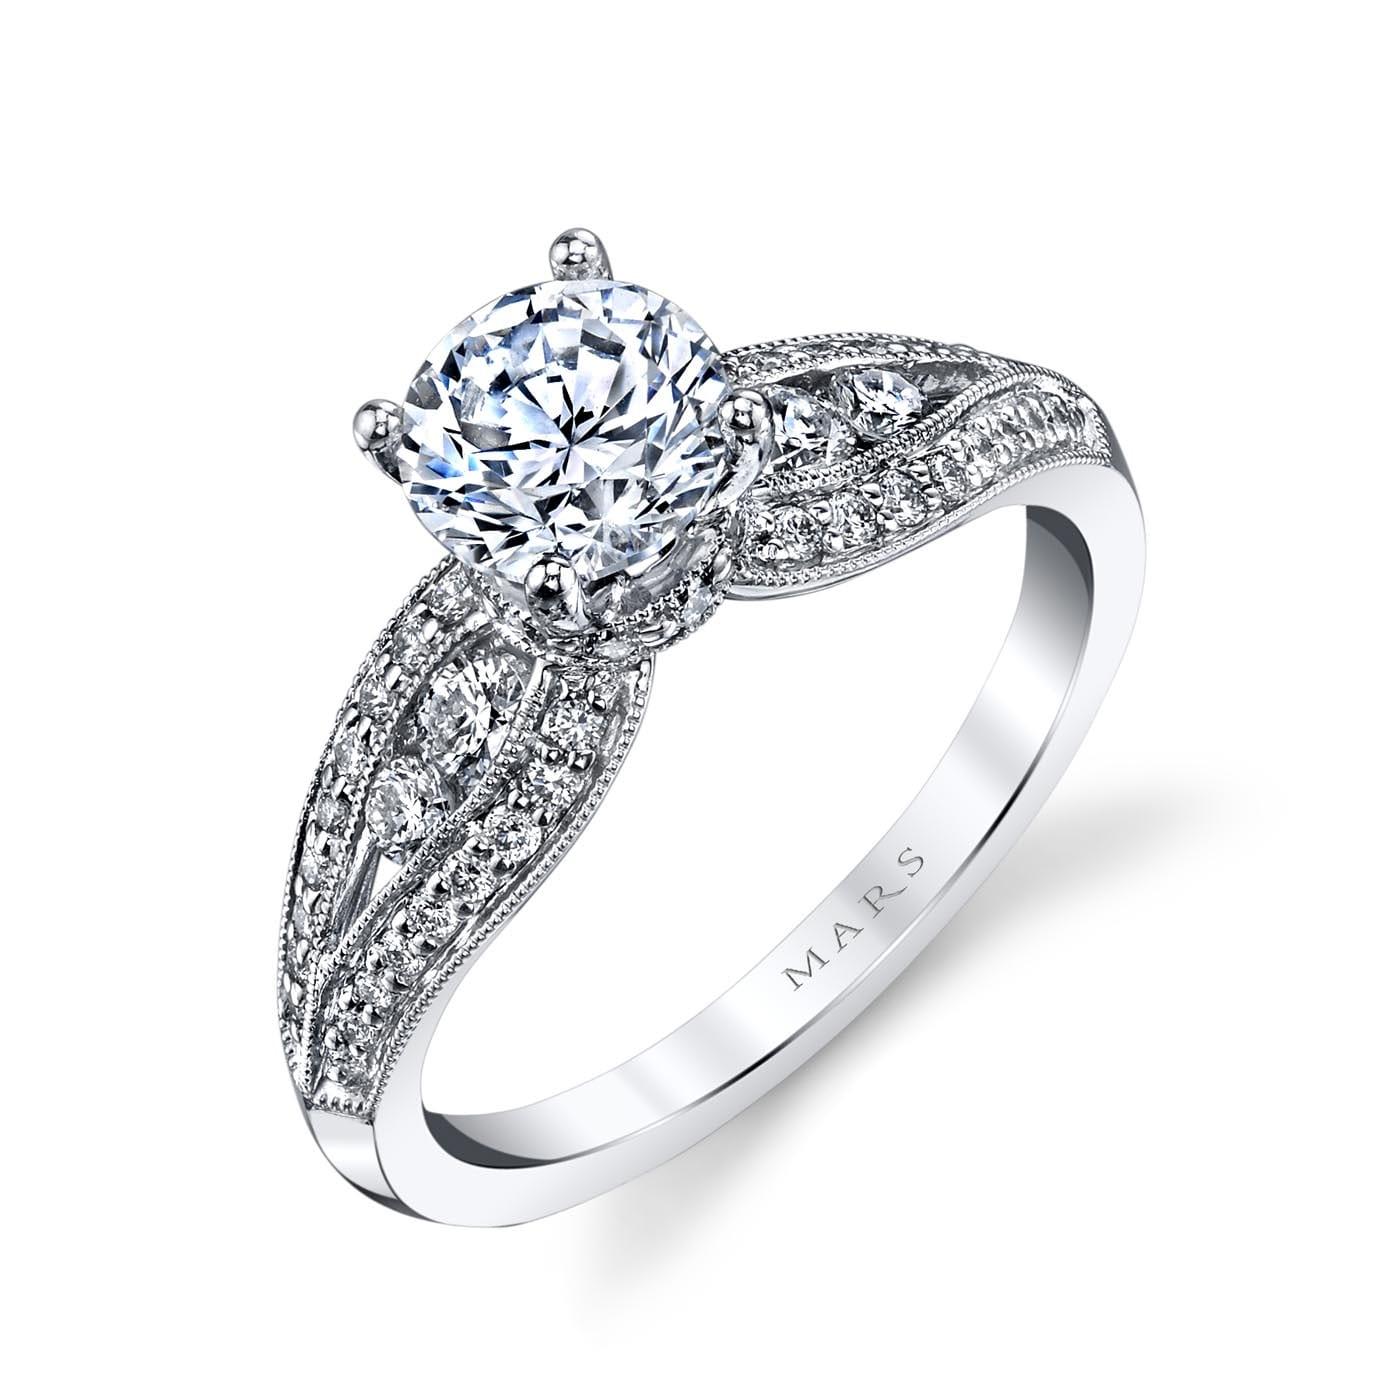 Vintage Engagement RingStyle #: MARS 25832